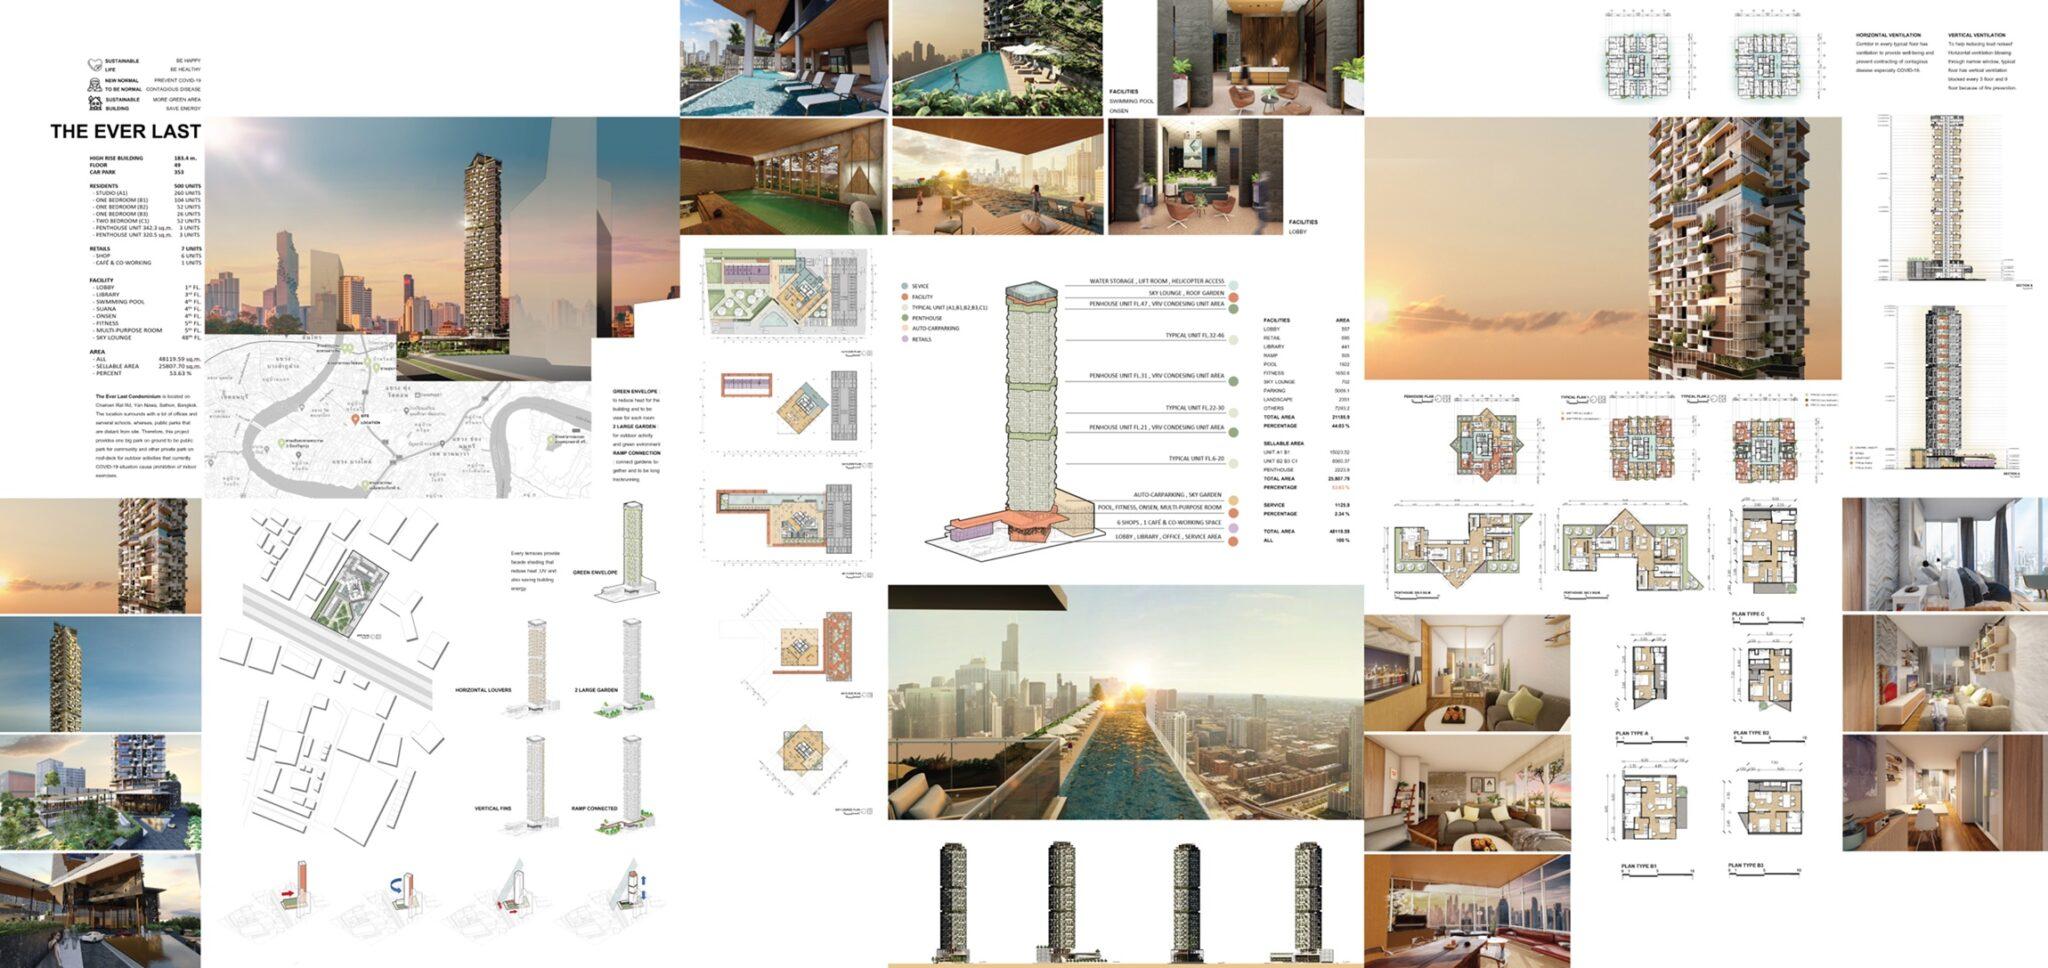 SUPALAI x ARCH CHULA ค้นหาสุดยอดนักออกแบบรุ่นใหม่ | Prop2Morrow บ้าน คอนโด ข่าวอสังหาฯ